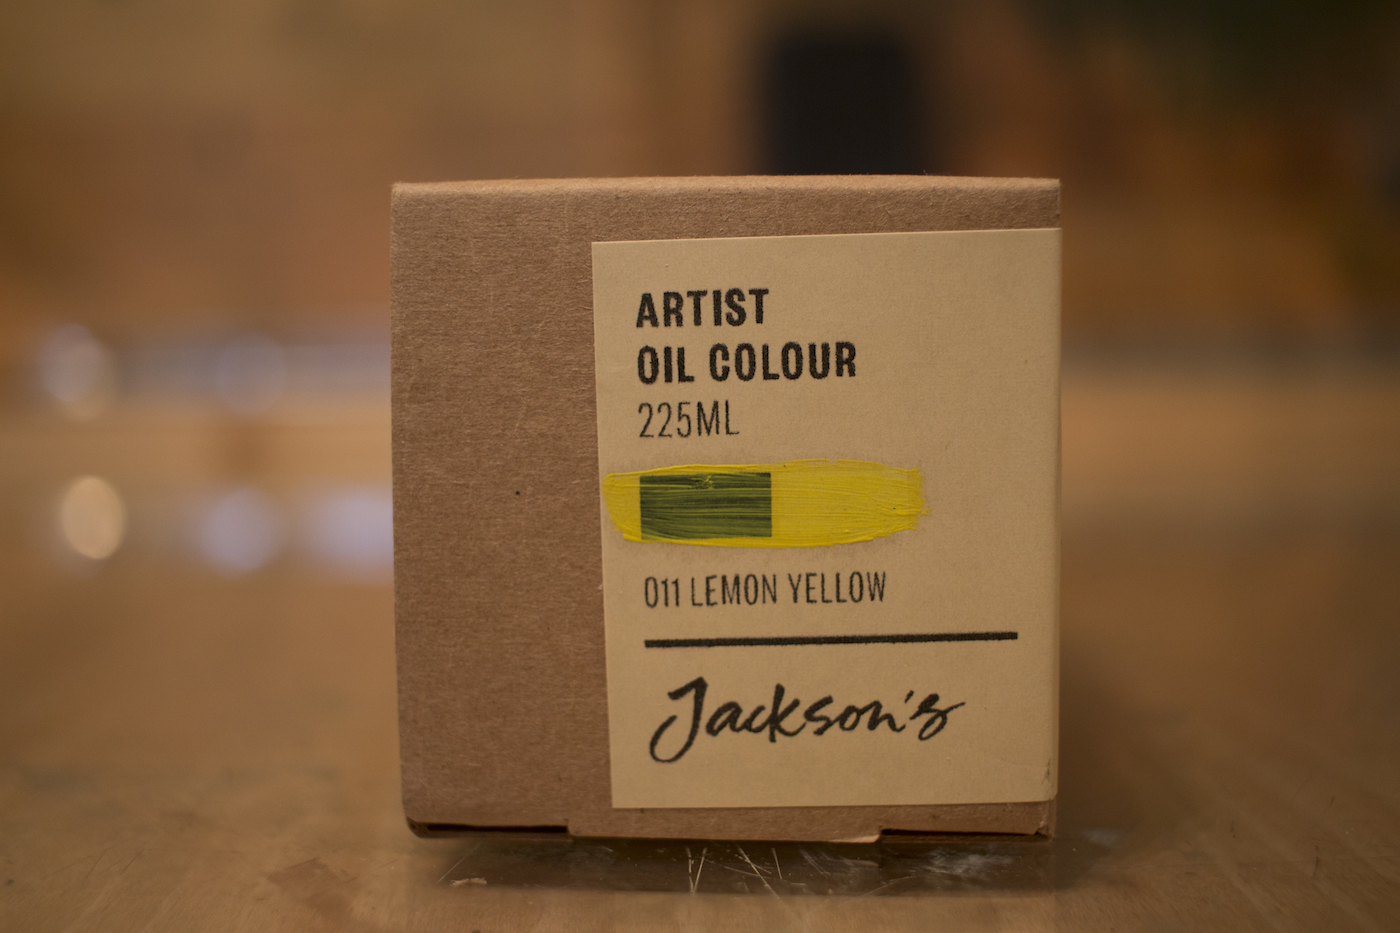 Jackson's Artist Oil Lemon Yellow box